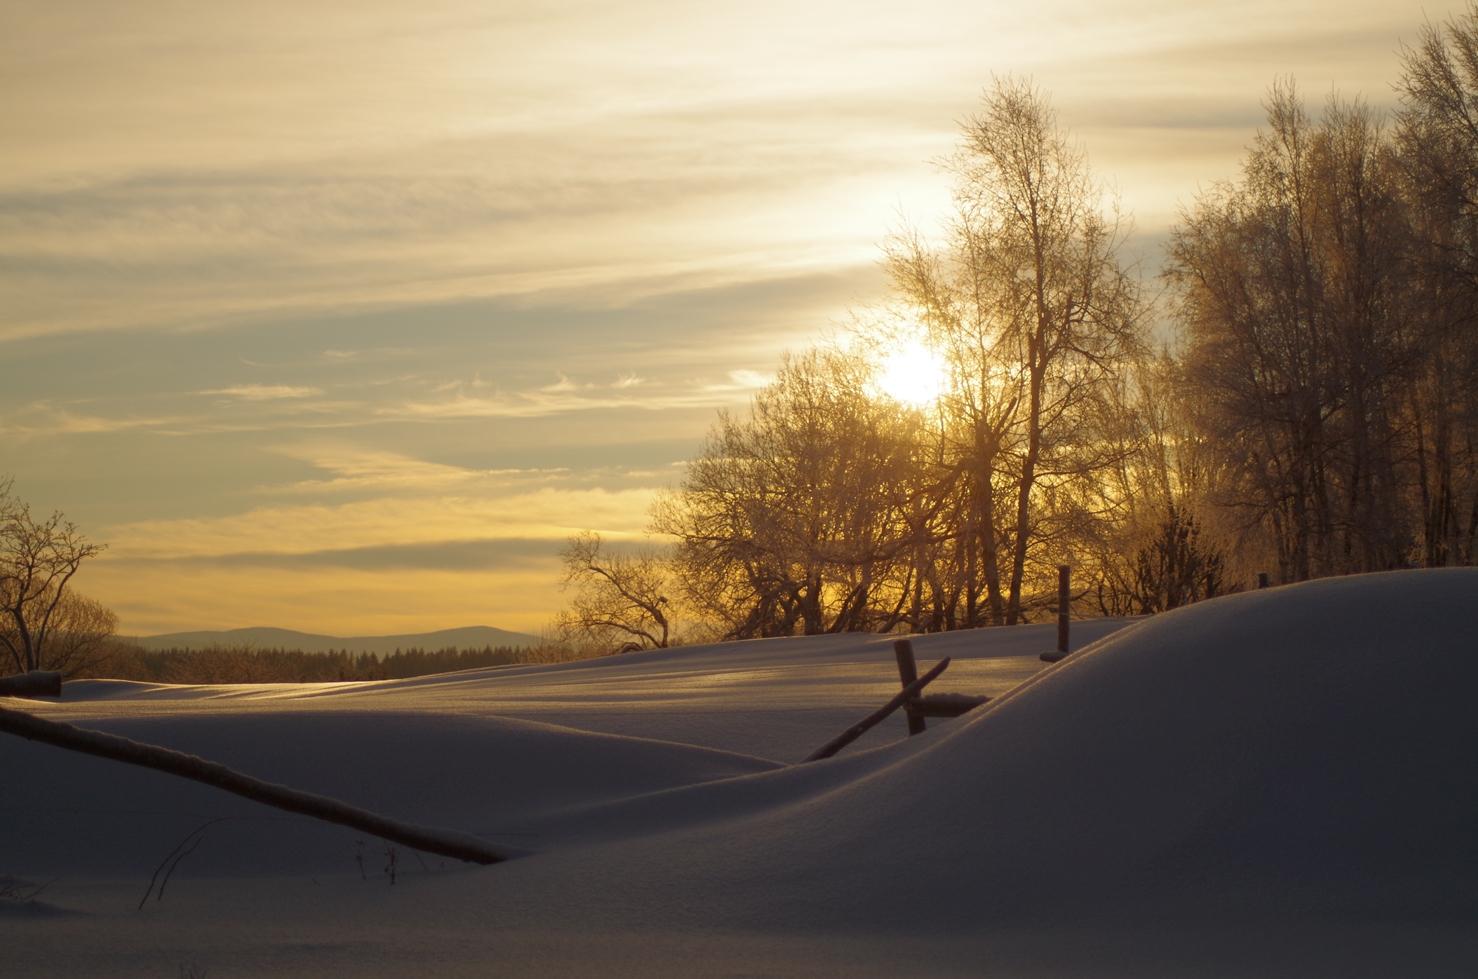 Klimat Kotliny - wschód słońca zimą